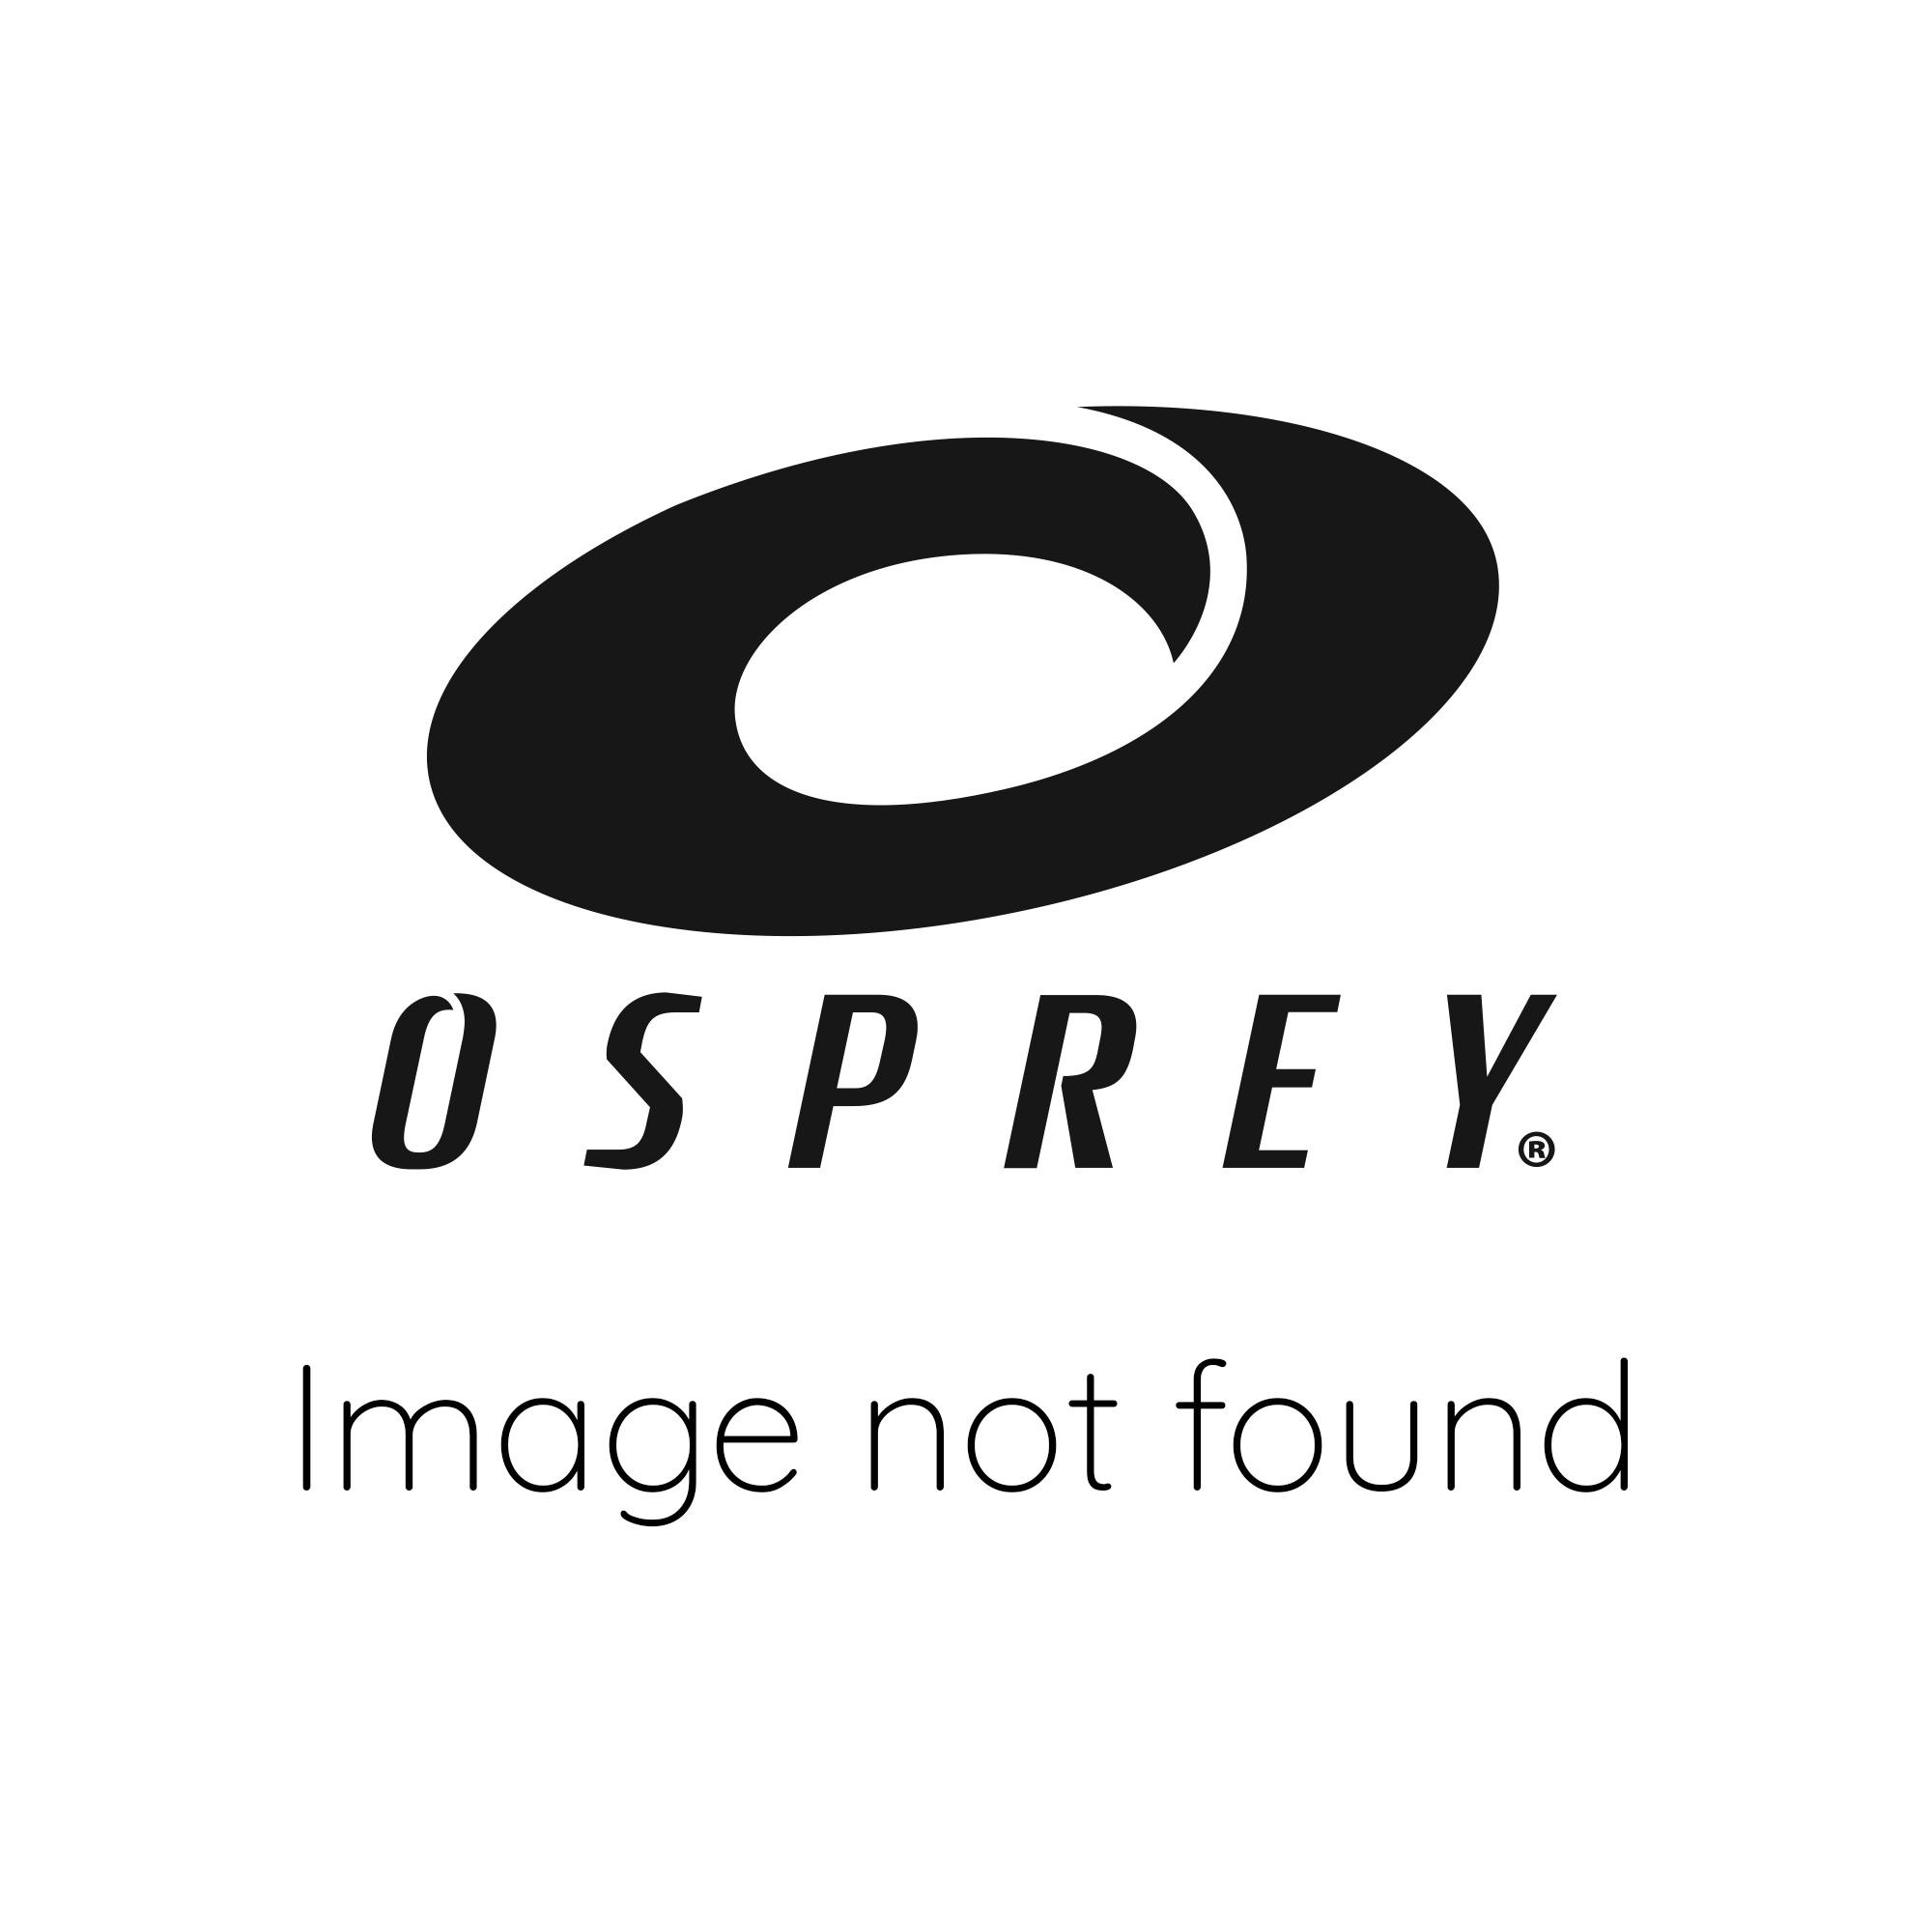 Blog - Top 5 Health Benefits of Roller Skating